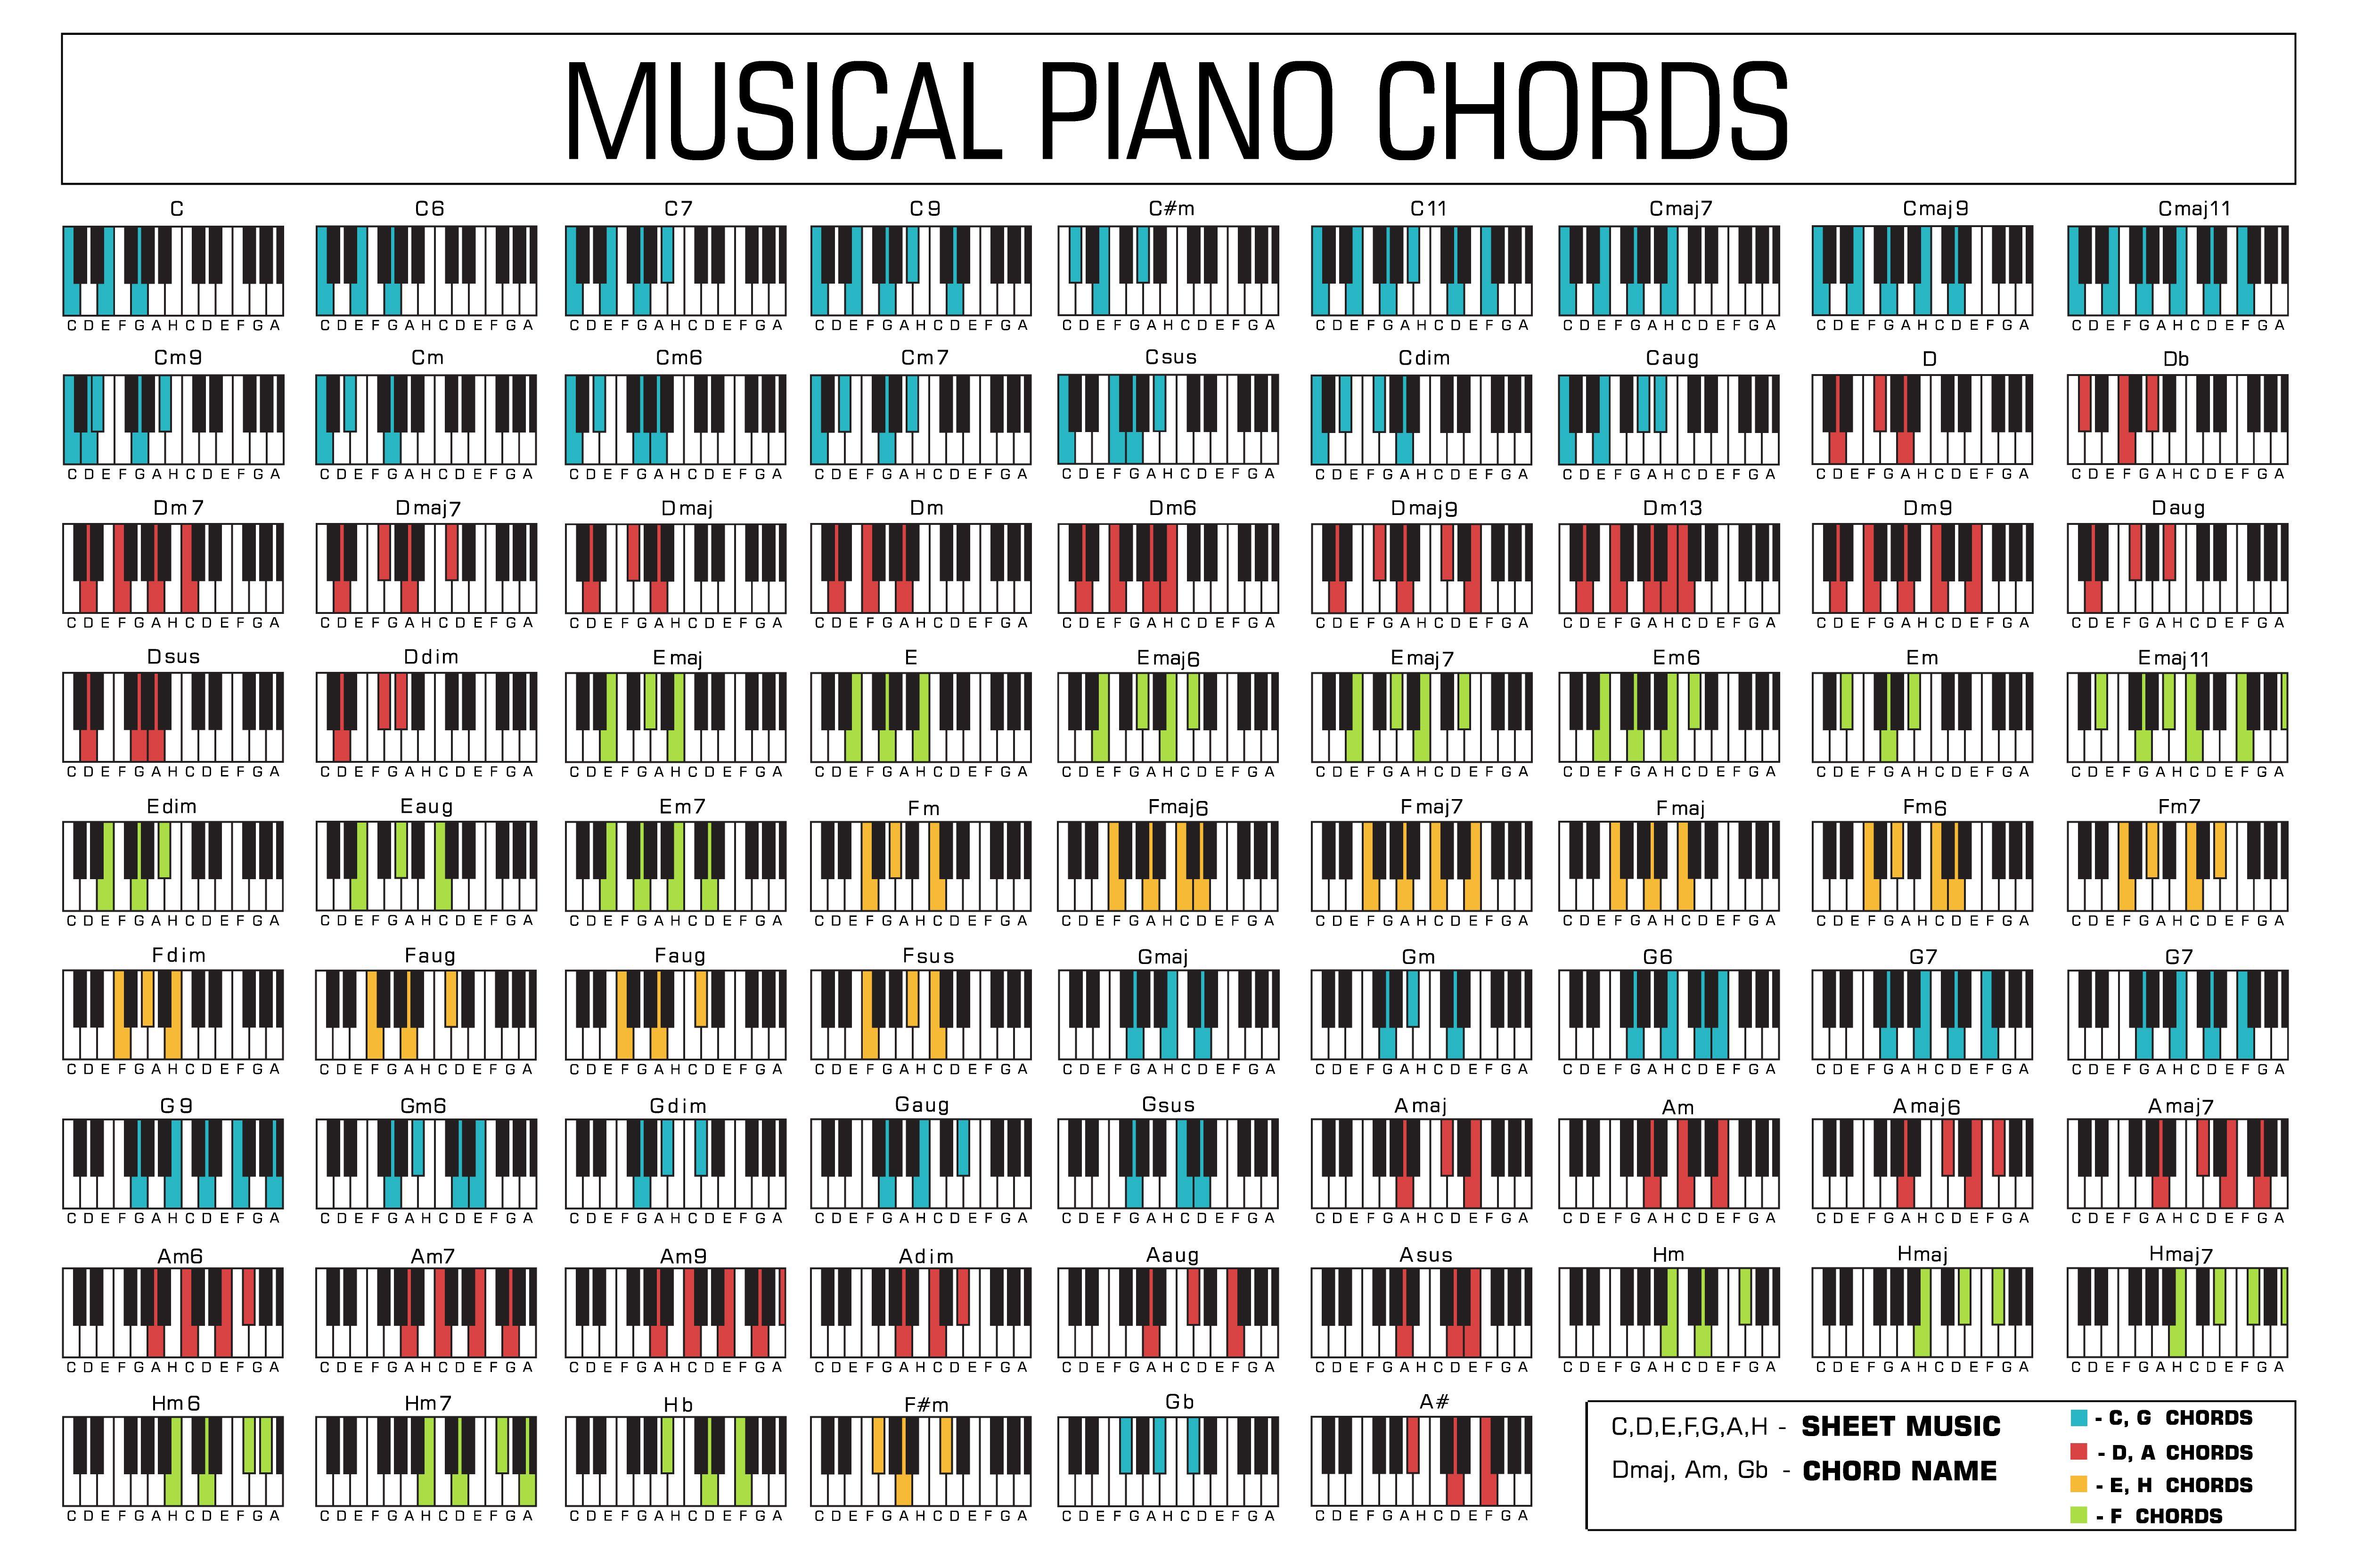 Virtual Piano - Online Piano Keyboard | OnlinePianist